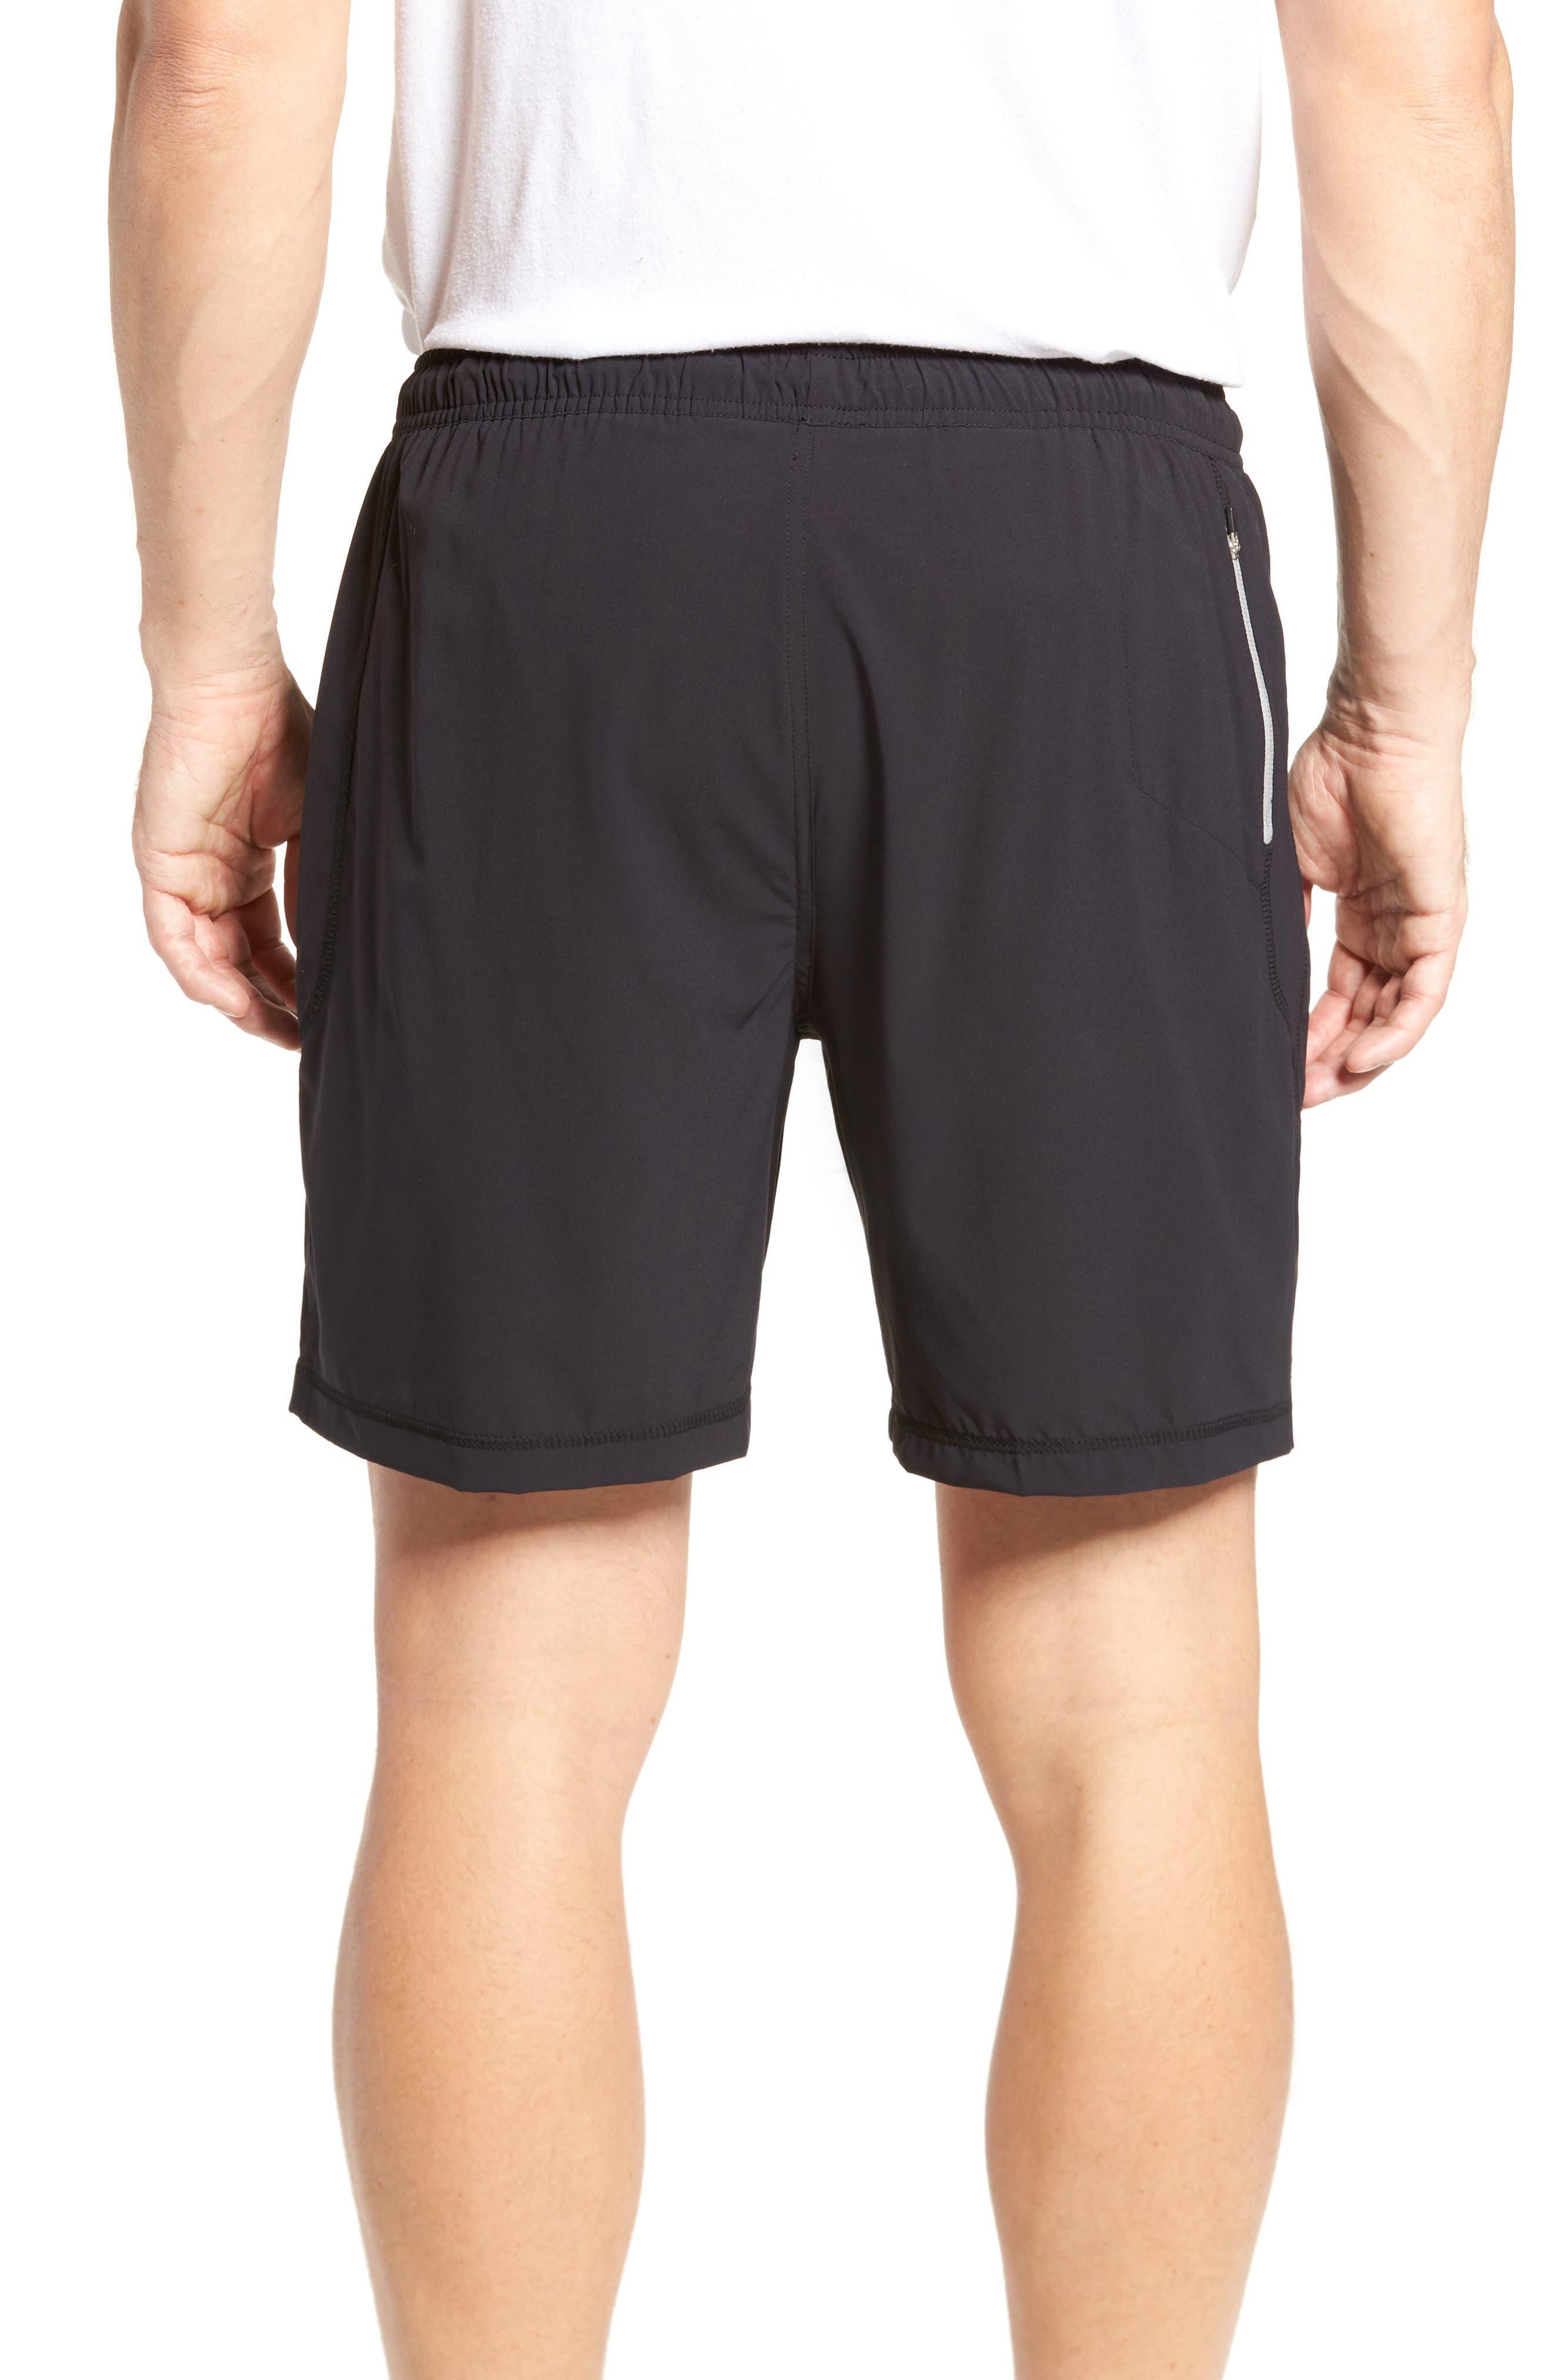 Propulsion Athletic Shorts,                             Alternate thumbnail 2, color,                             BLACK